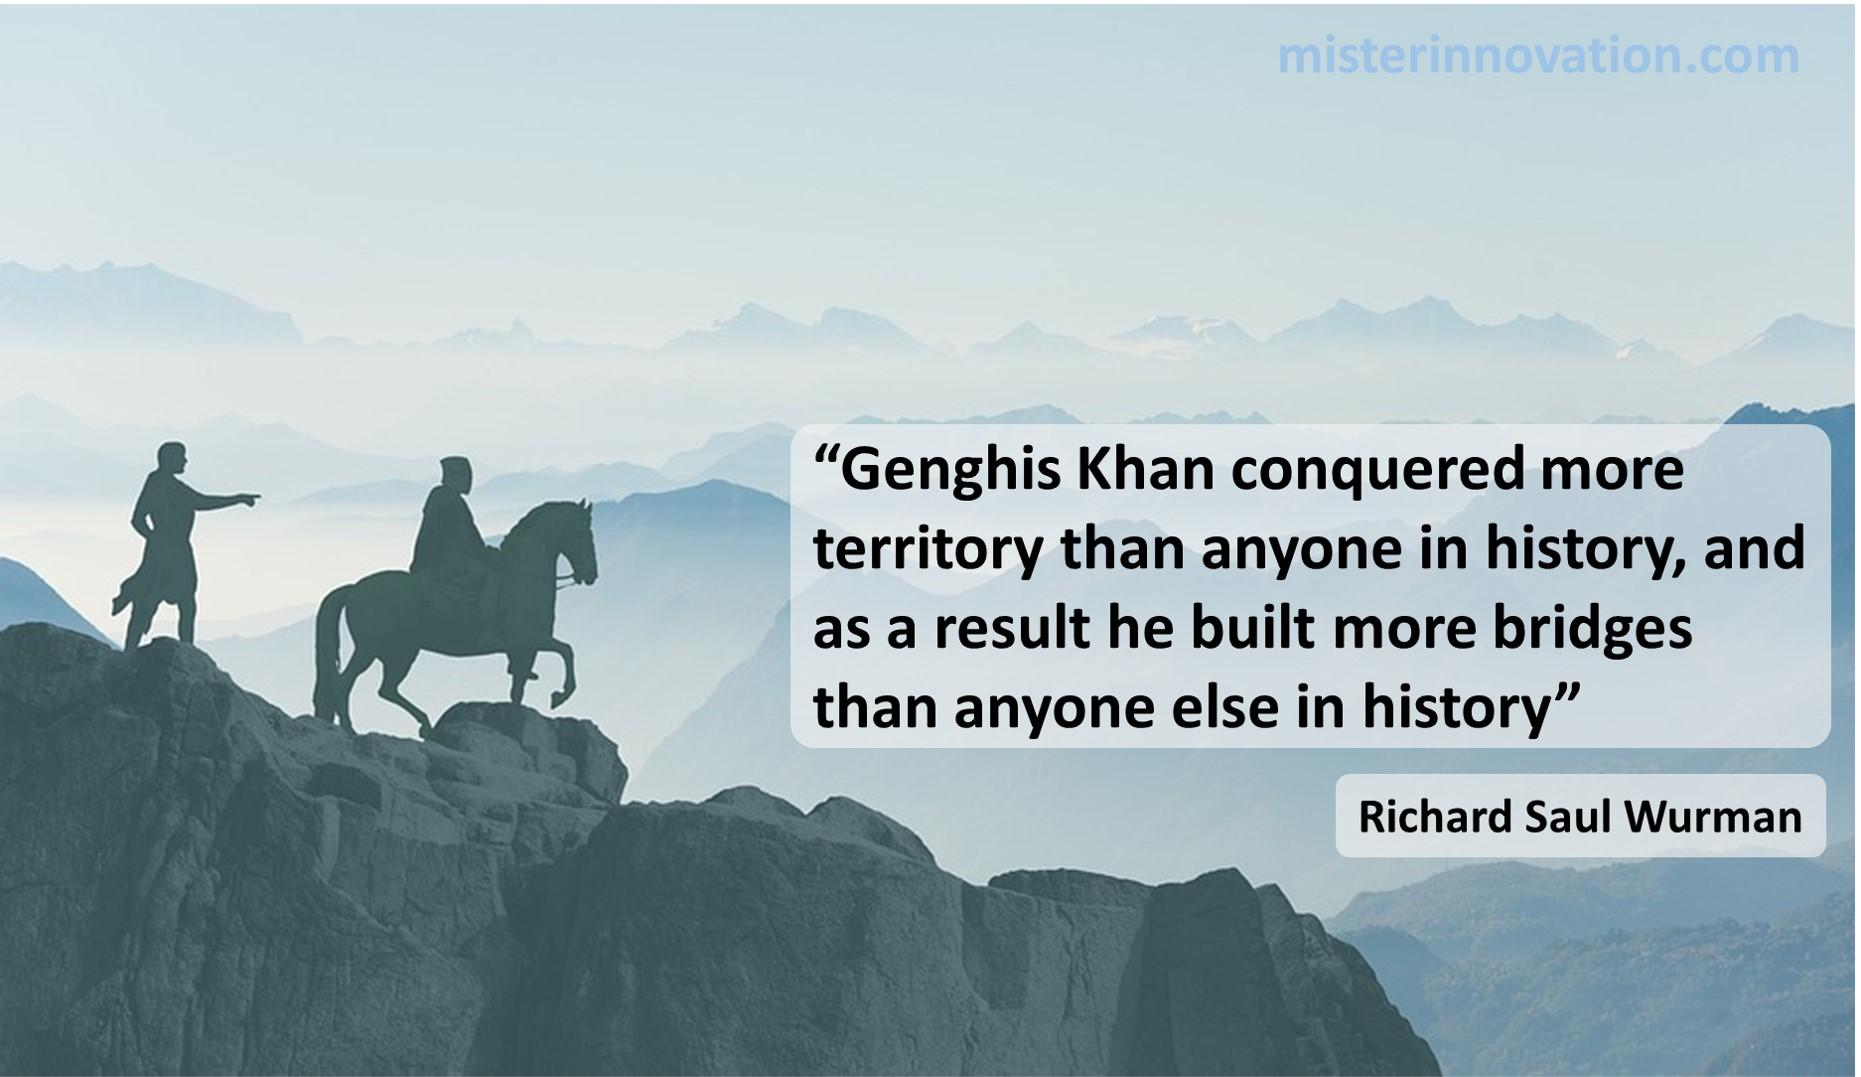 Richard Saul Wurman Genghis Khan